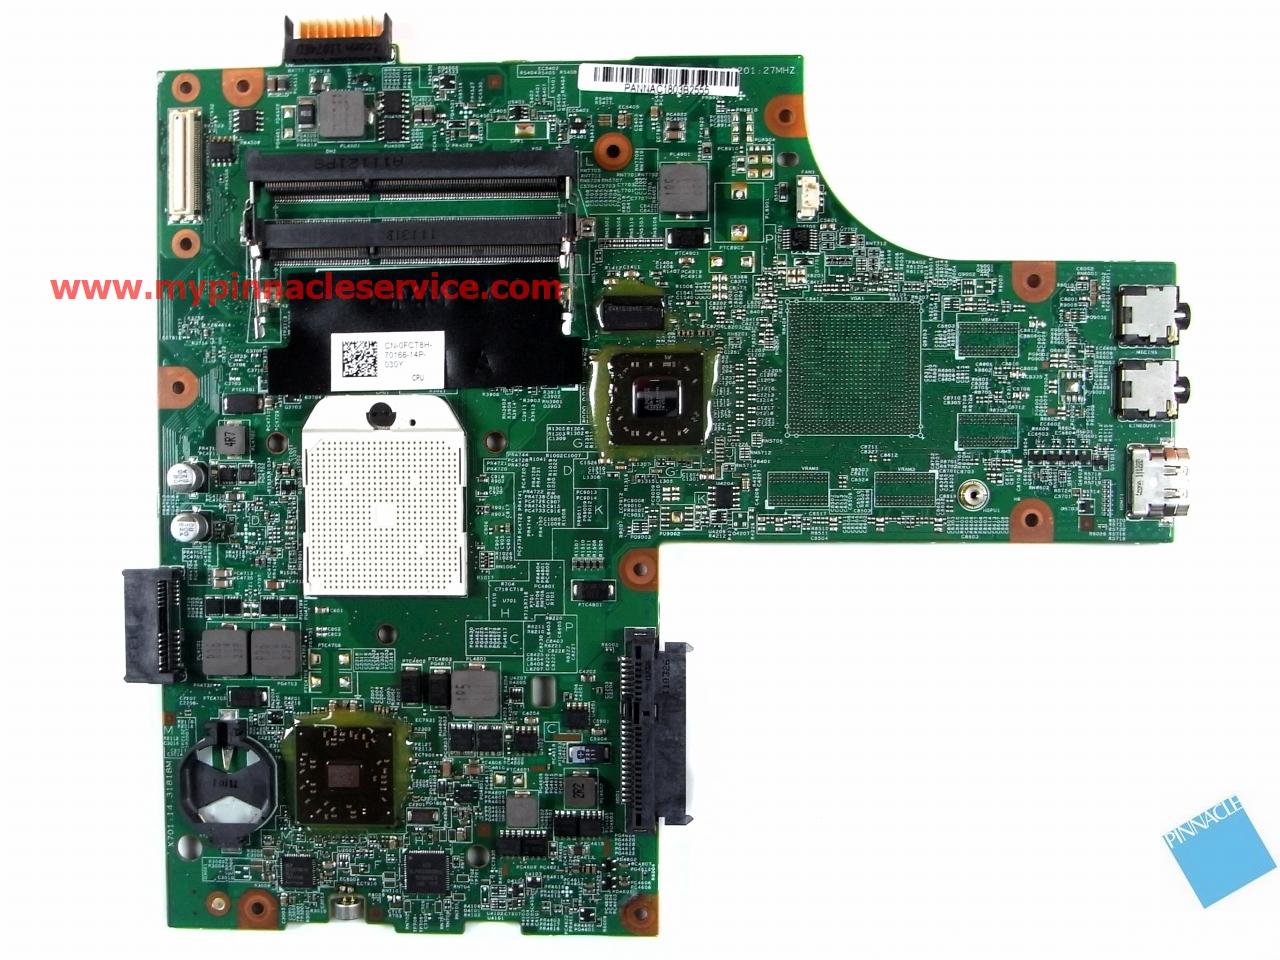 0FJ2GT Dell Inspiron 15R M5110 AMD Motherboard FJ2GT